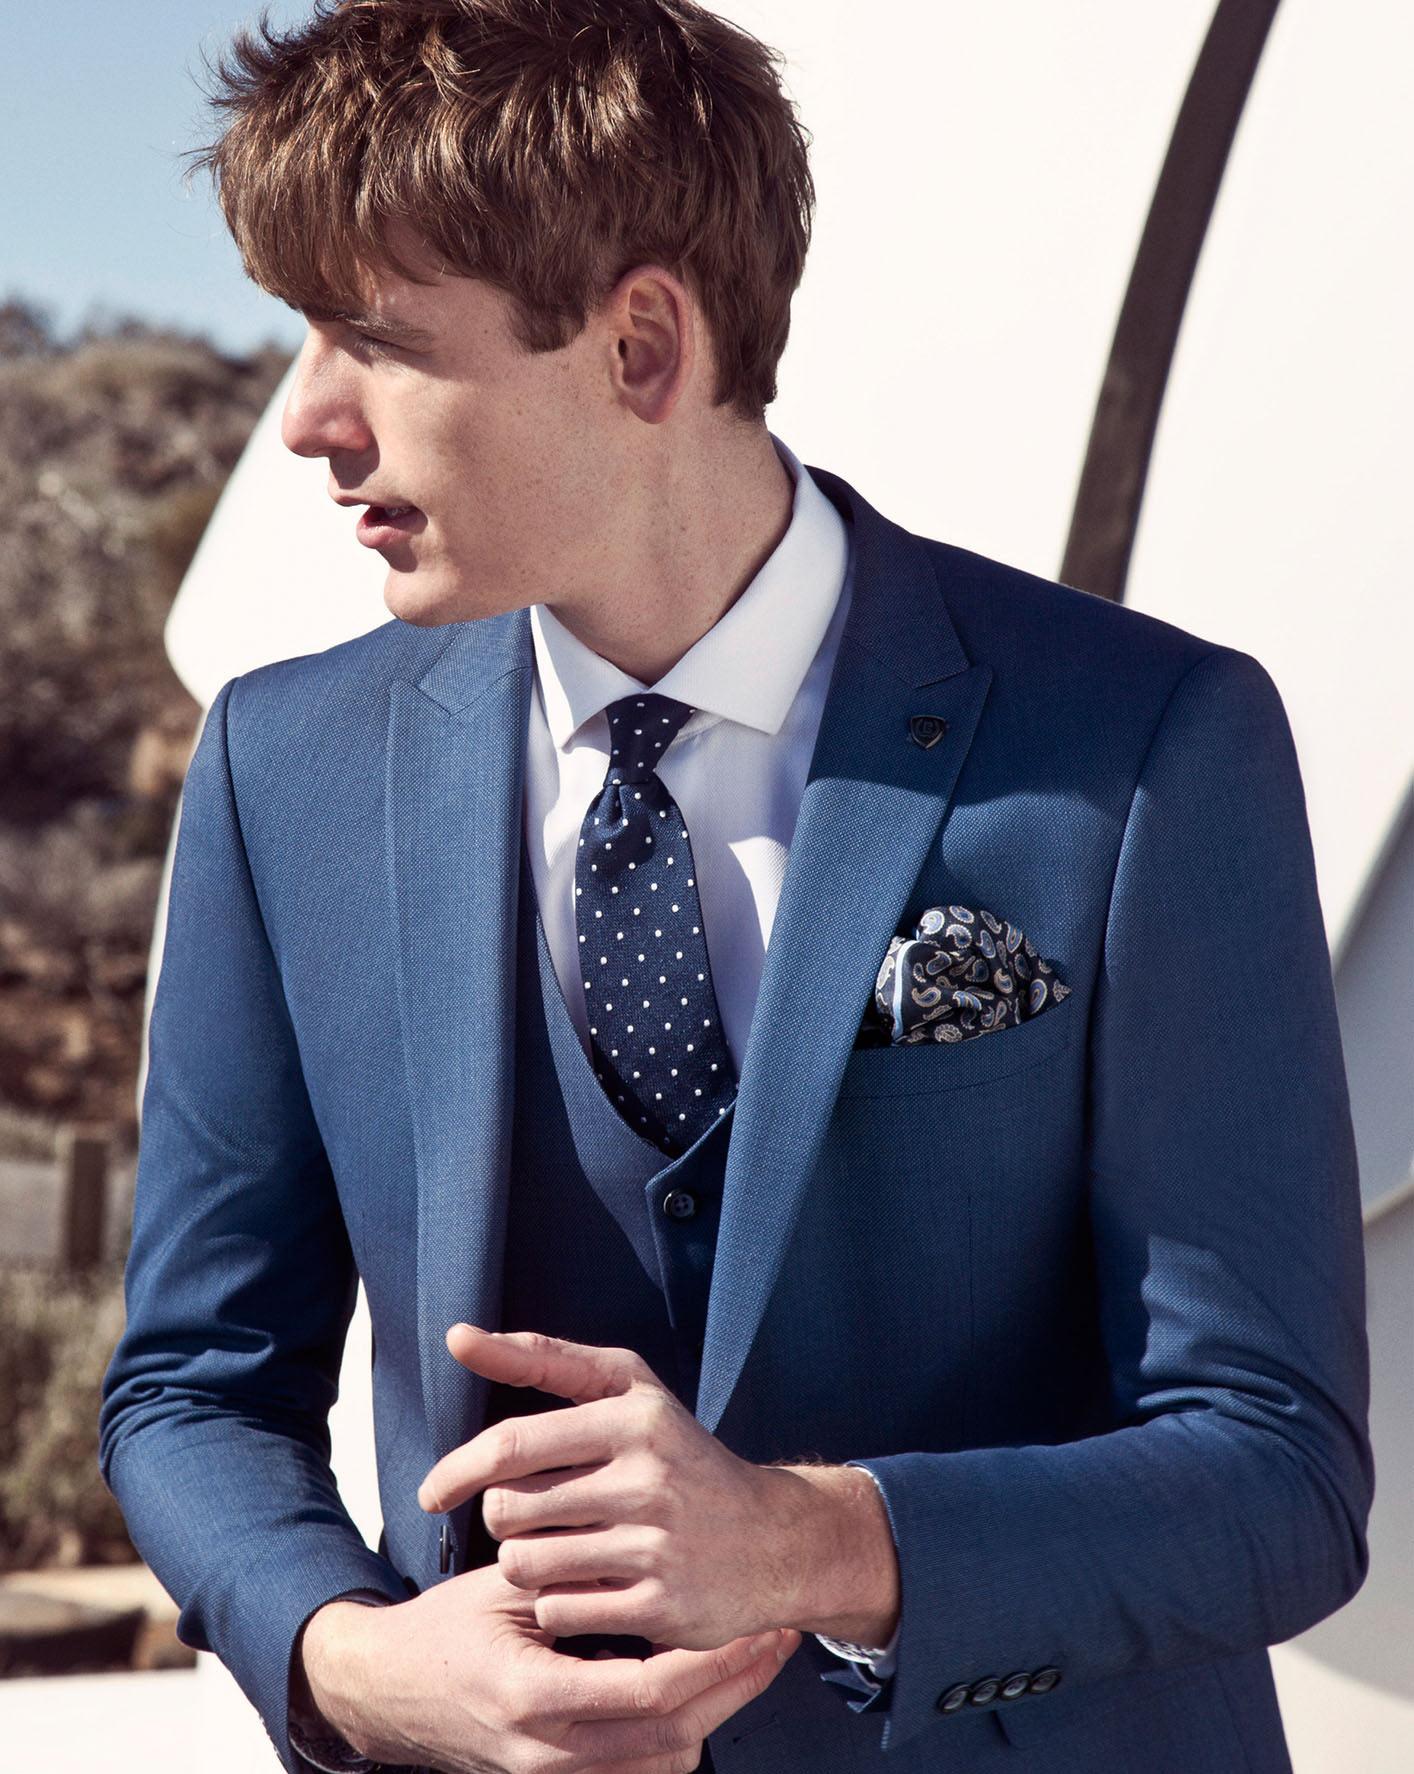 Benetti - Leonard - Petrol - Suit